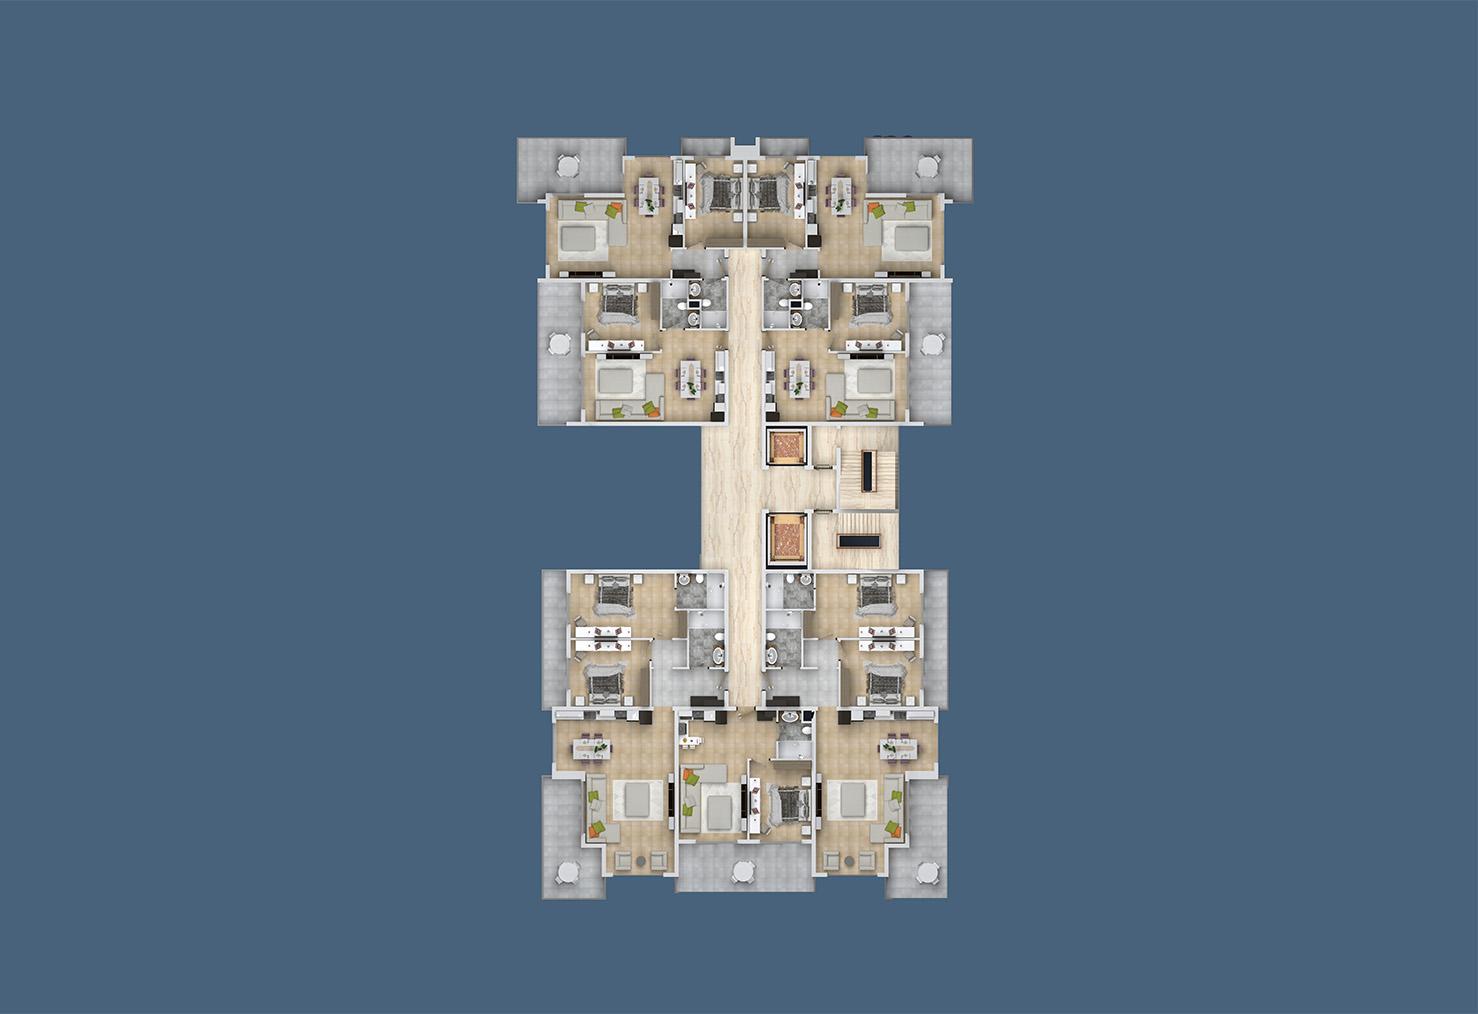 План расположения квартир 4 этаж C Yekta Kingdom Trade Center